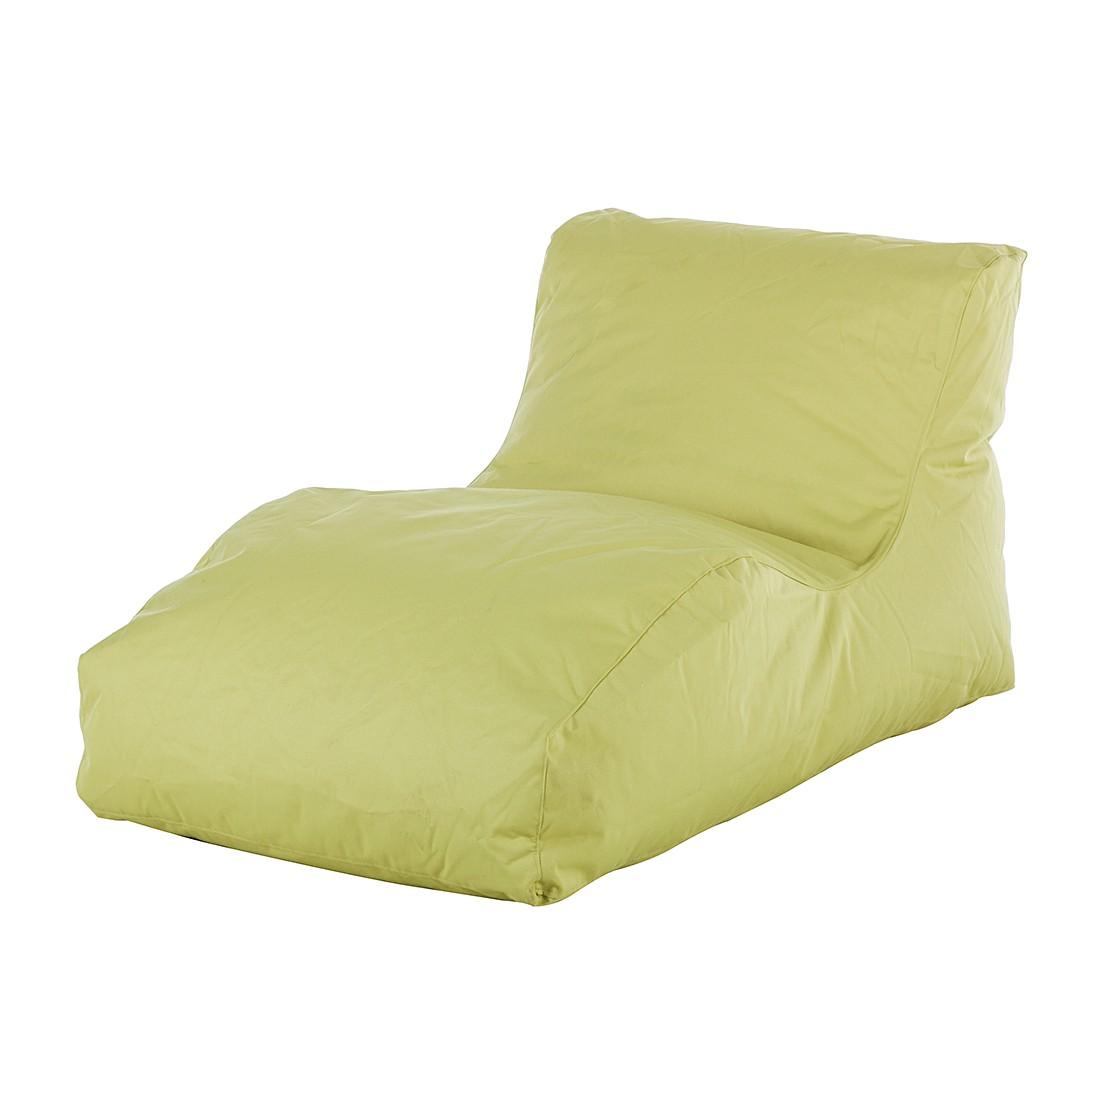 Sitzliege Wave Plus – Stoff Lime, OUTBAG jetzt kaufen